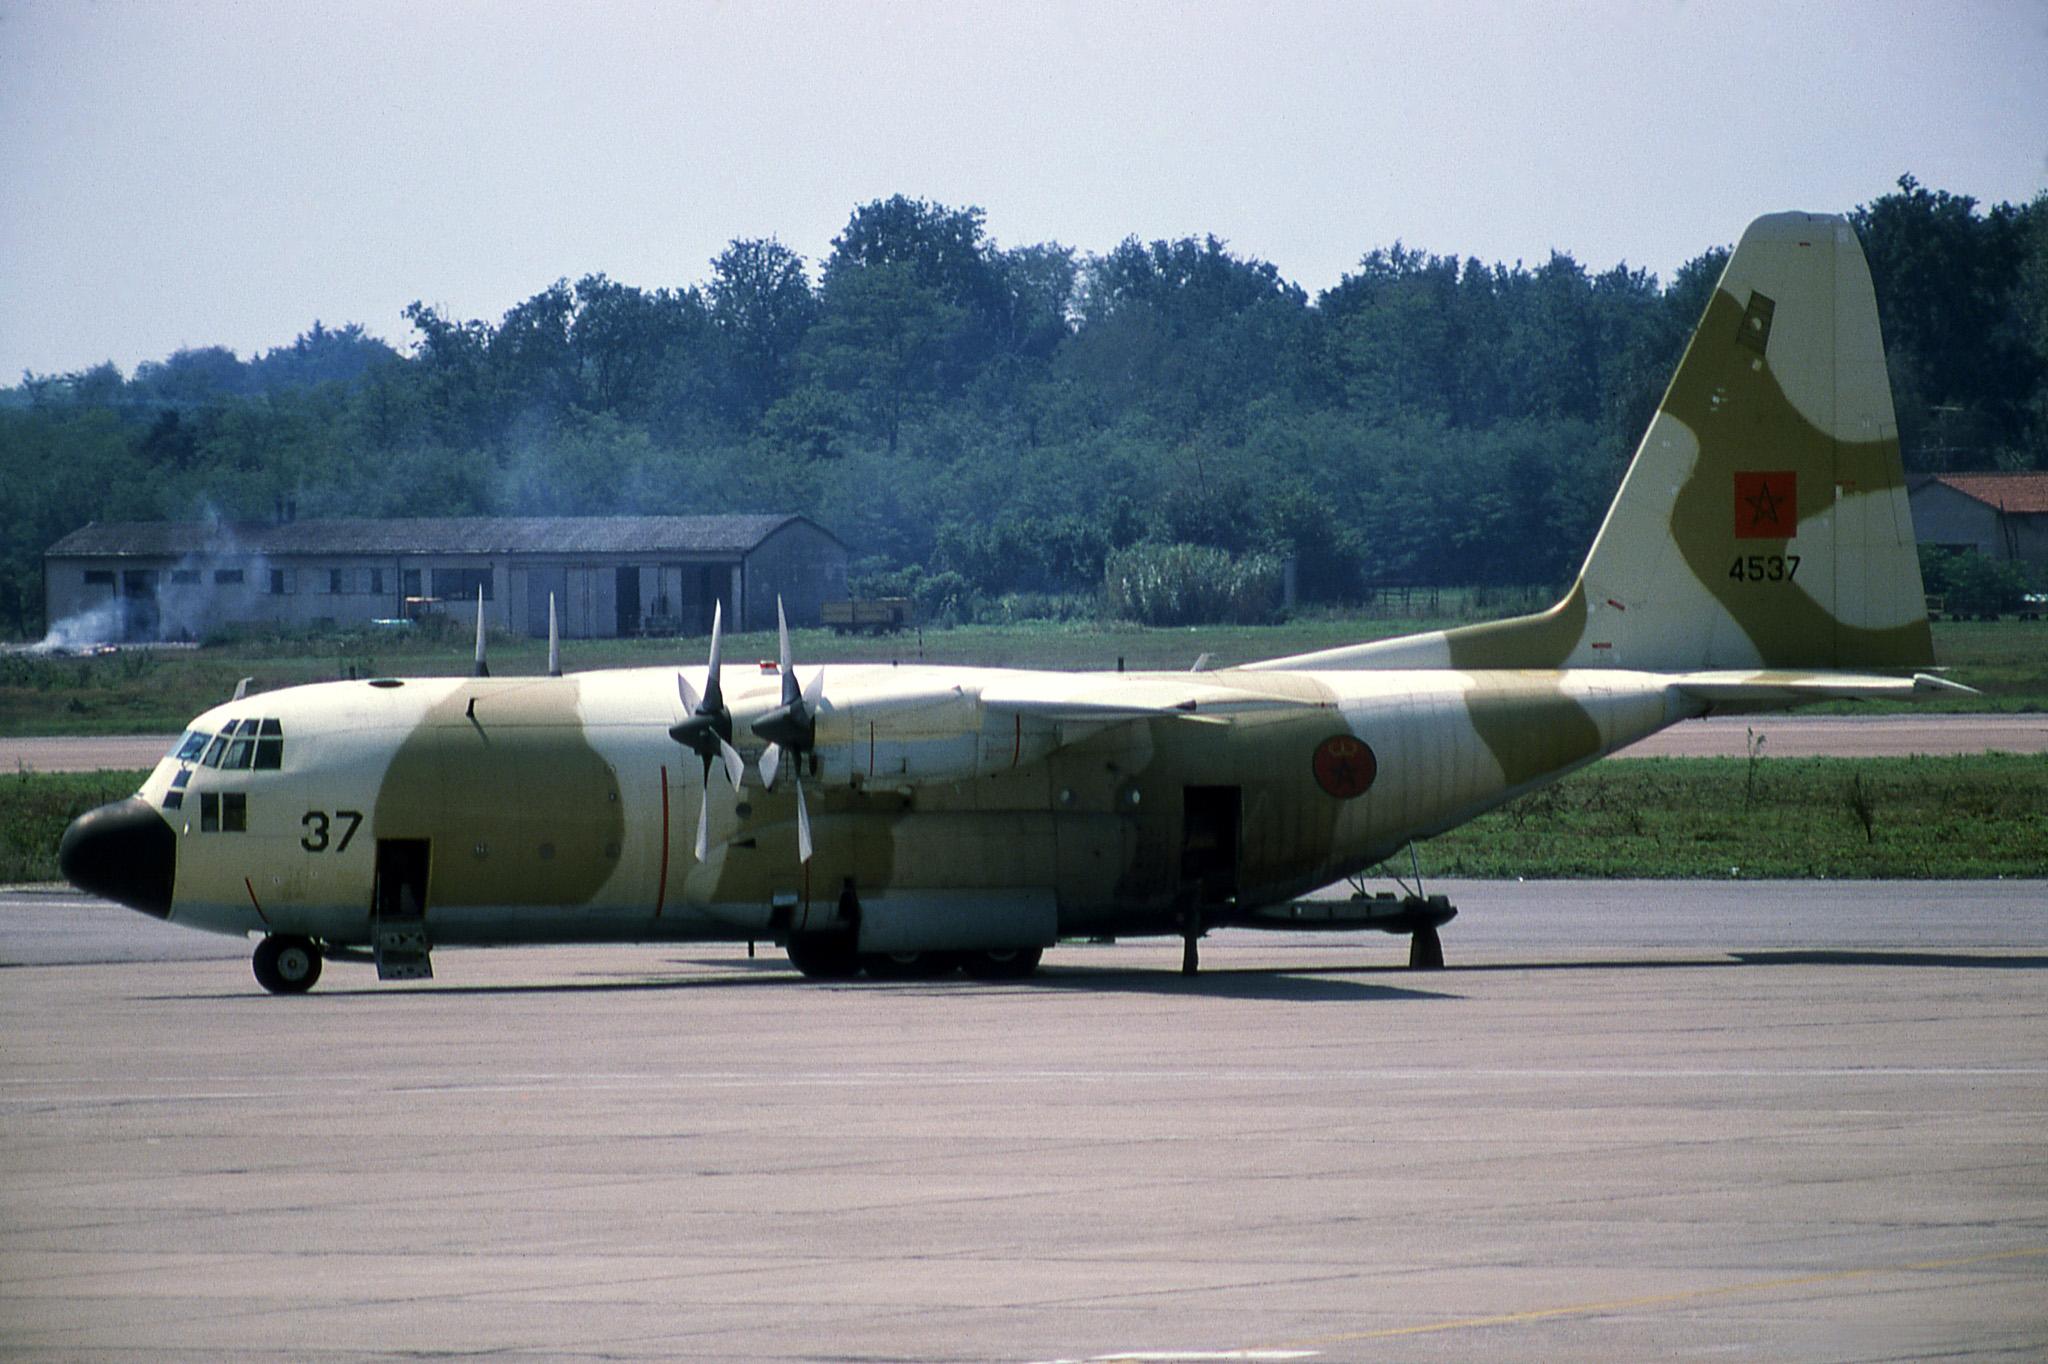 FRA: Photos d'avions de transport - Page 38 48463476947_26c203c8ab_o